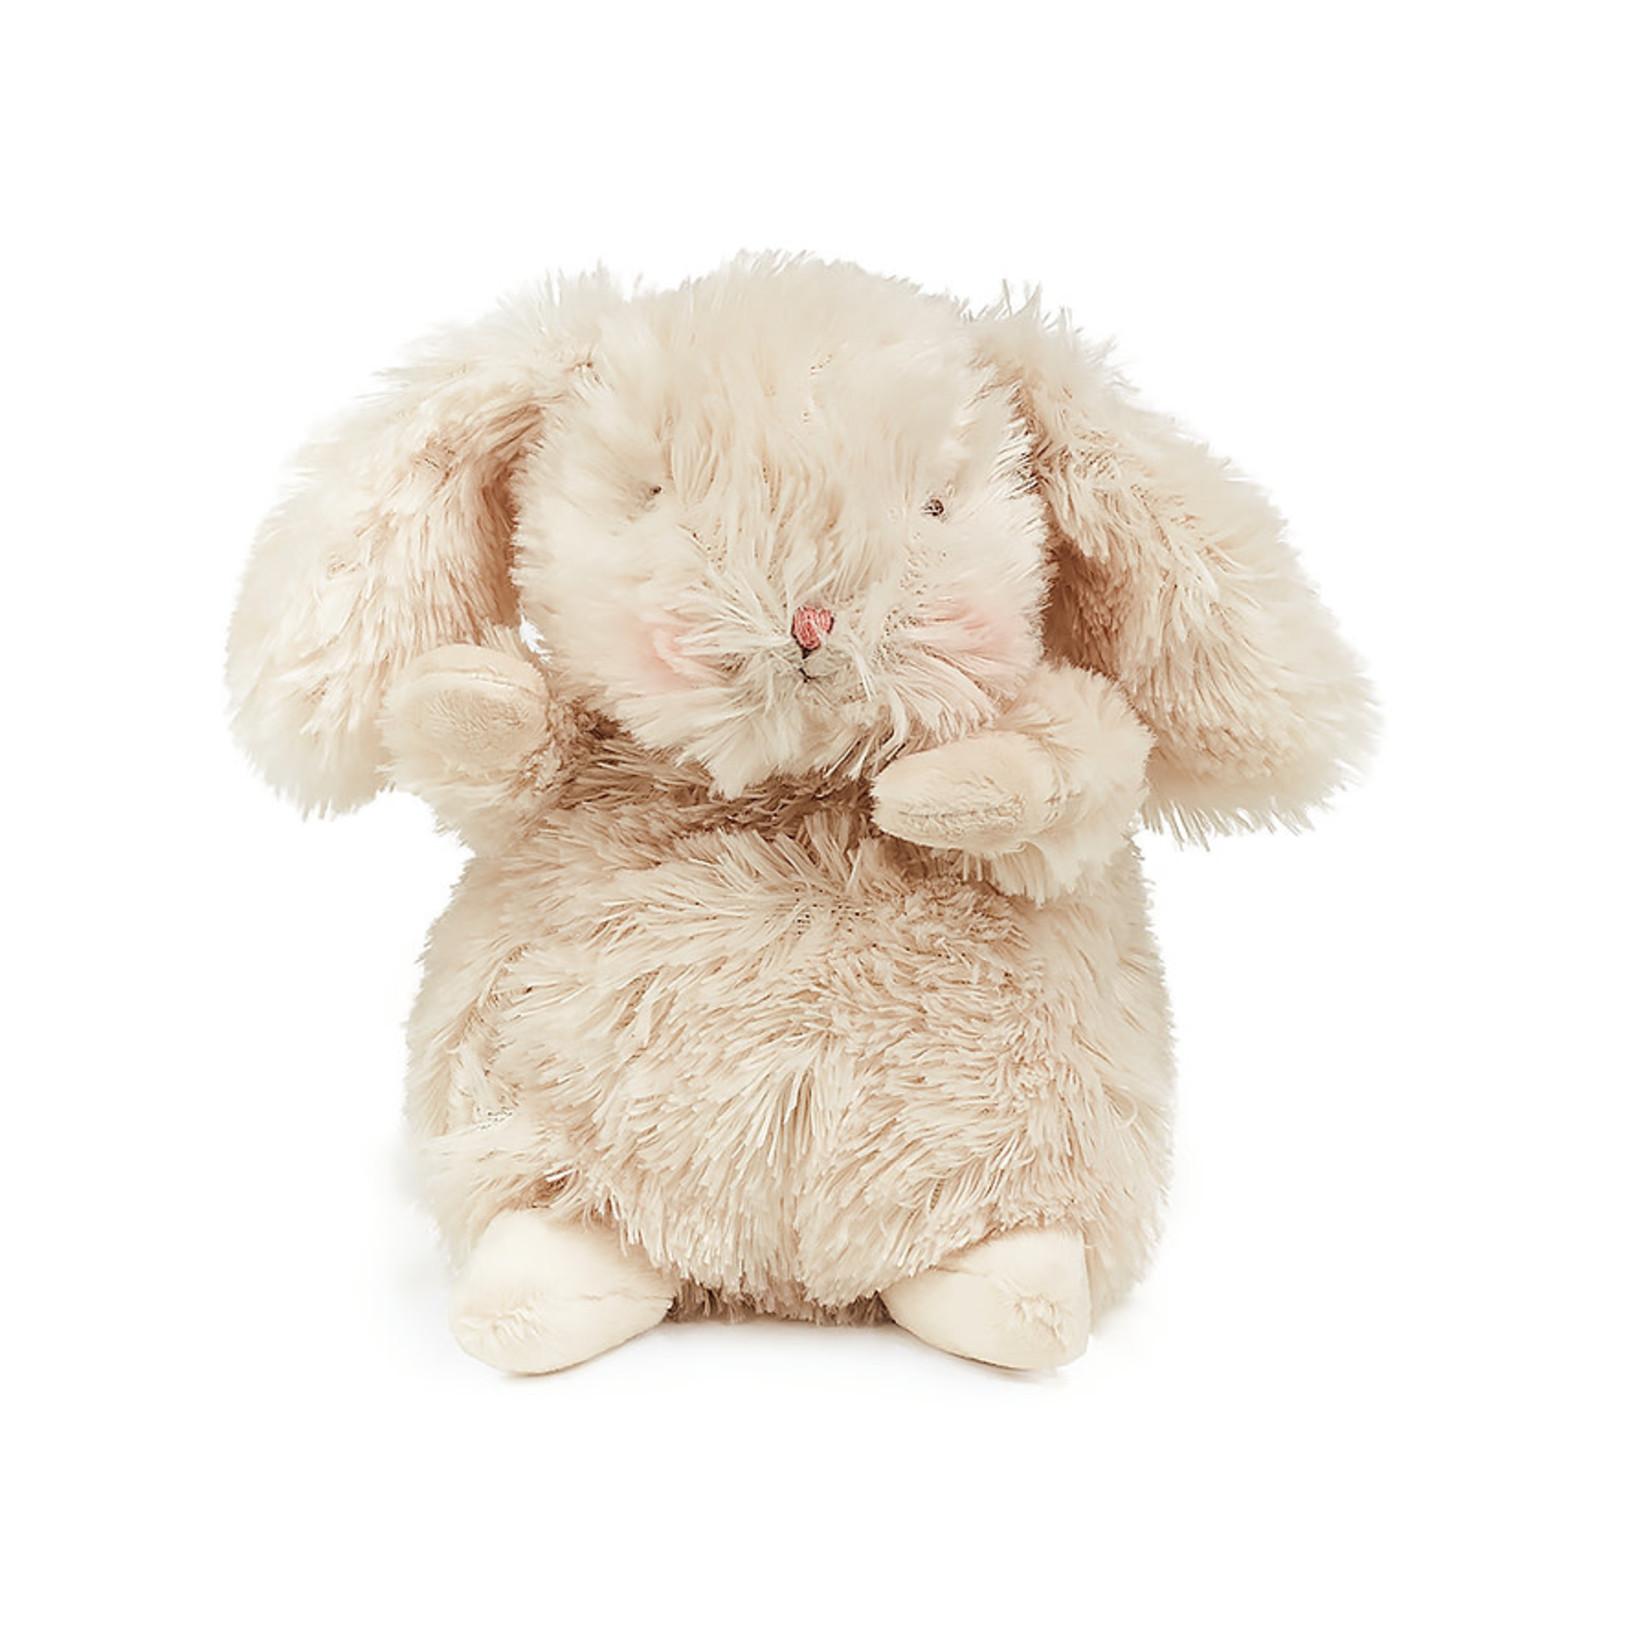 Bunnies By the Bay Rutabaga Floppy Bun Plush Doll